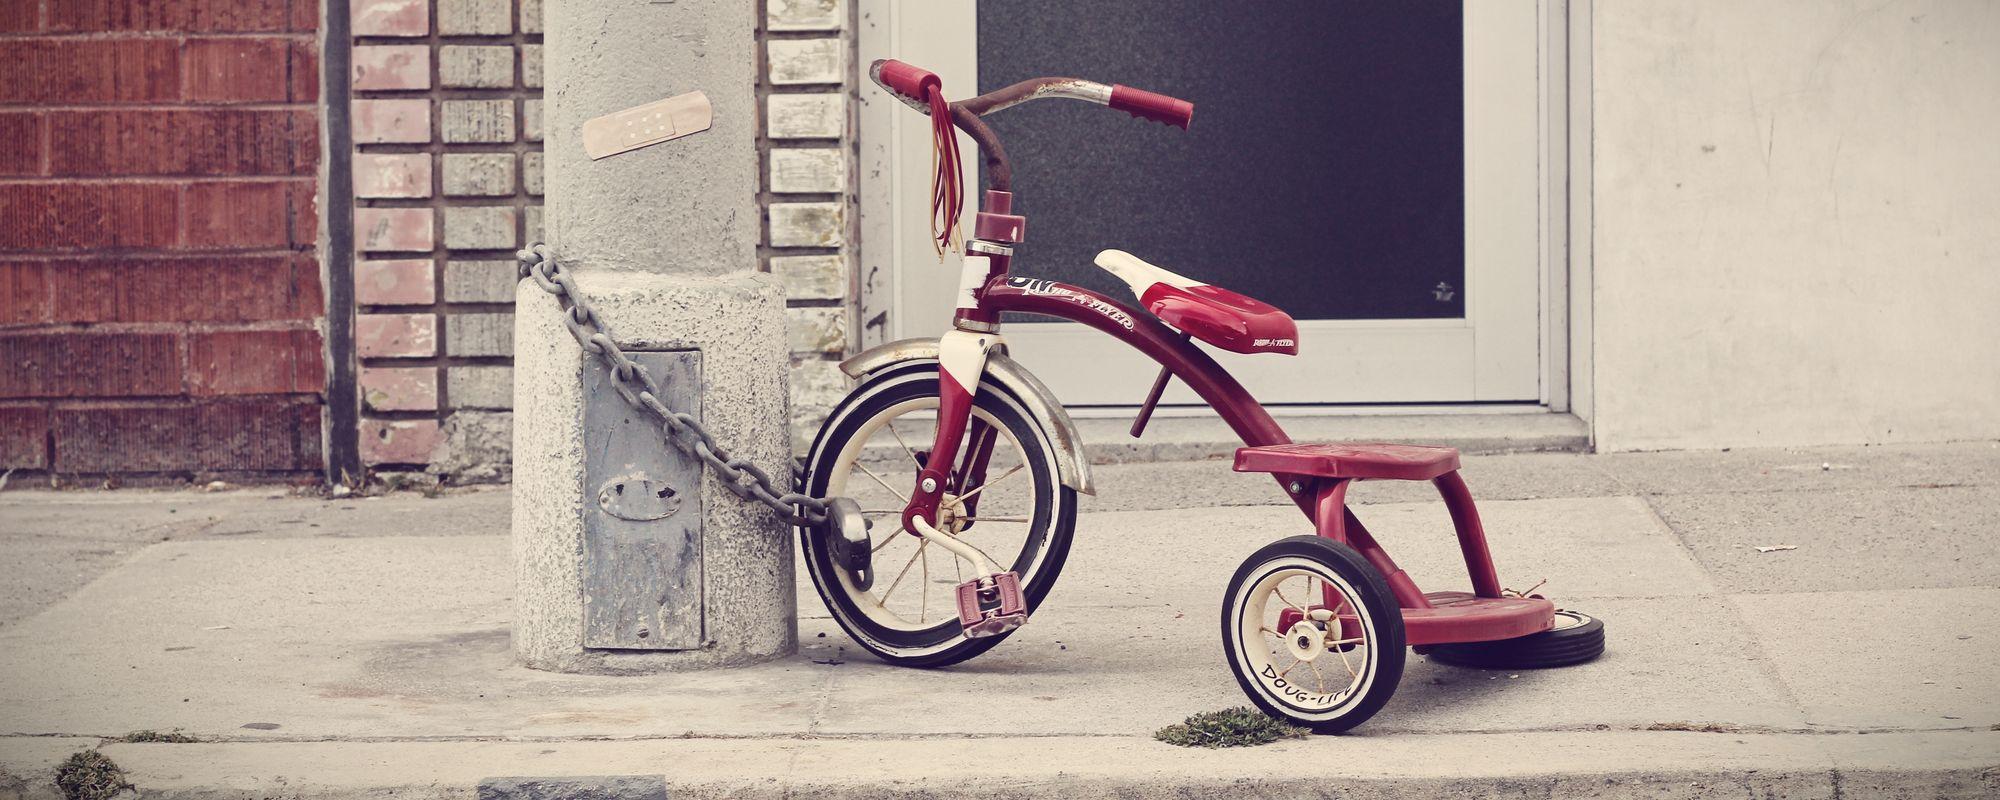 Tricicleta cu antifurt.